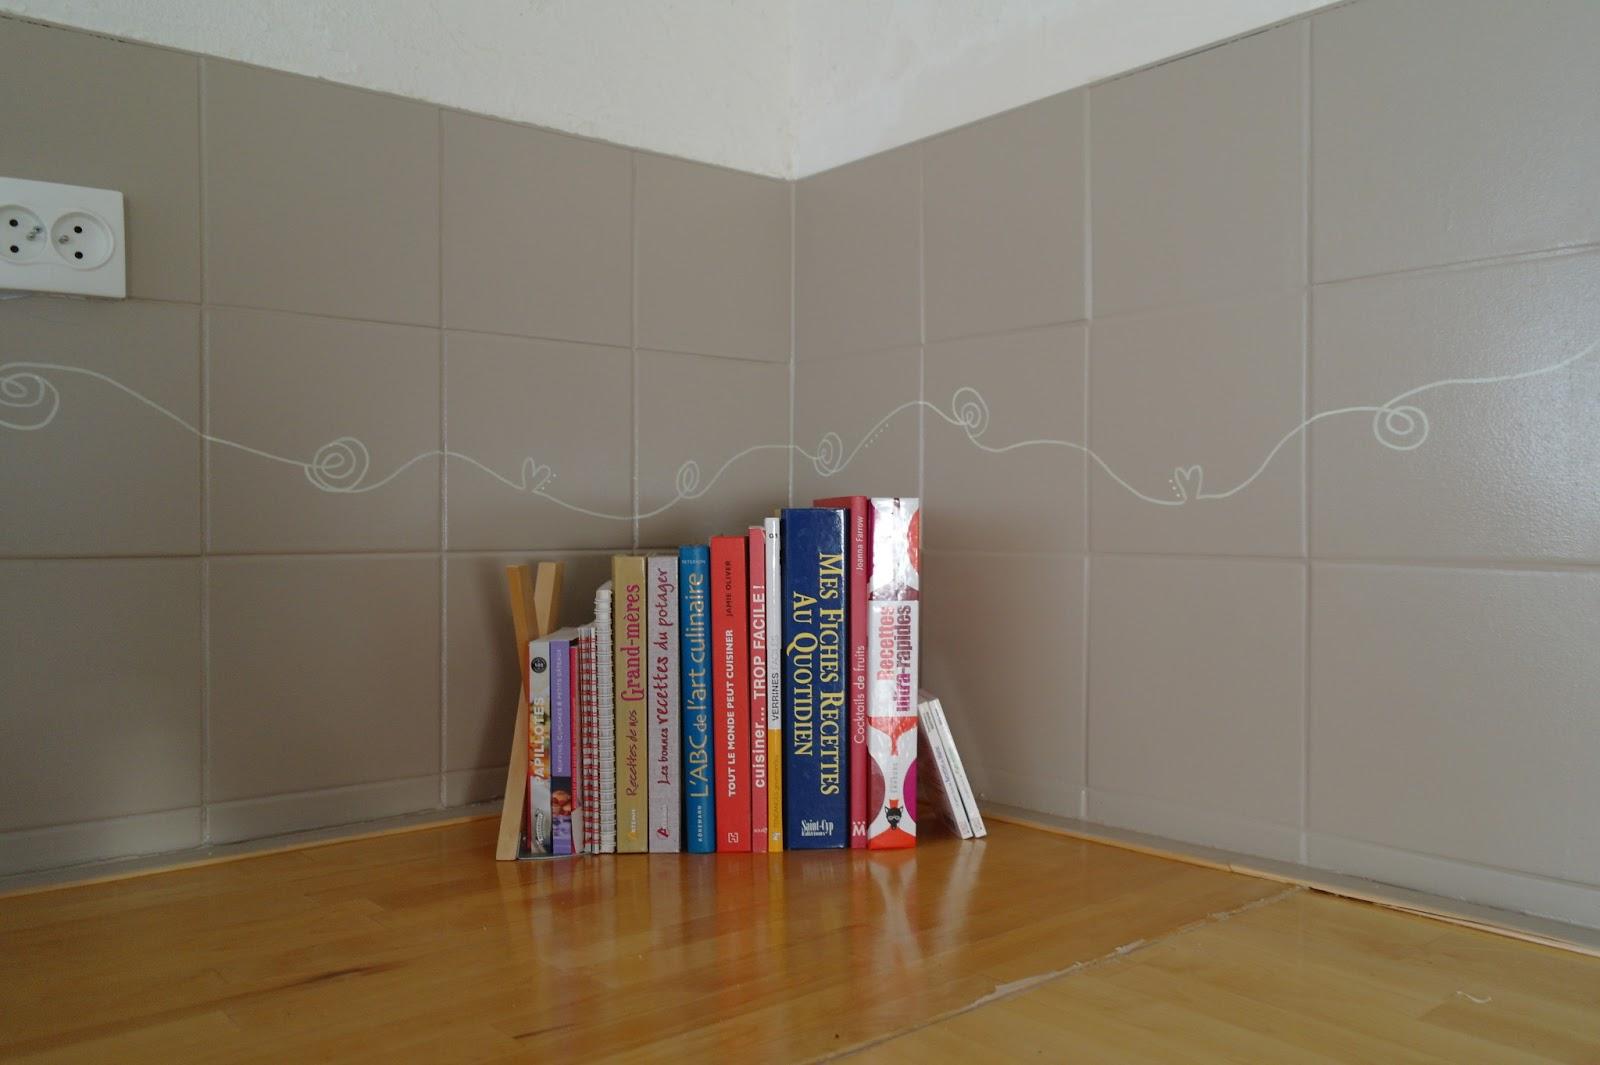 prix beton cir m2 cheap prix beton pour terrasse d licieux nos conseils x with prix beton cir. Black Bedroom Furniture Sets. Home Design Ideas